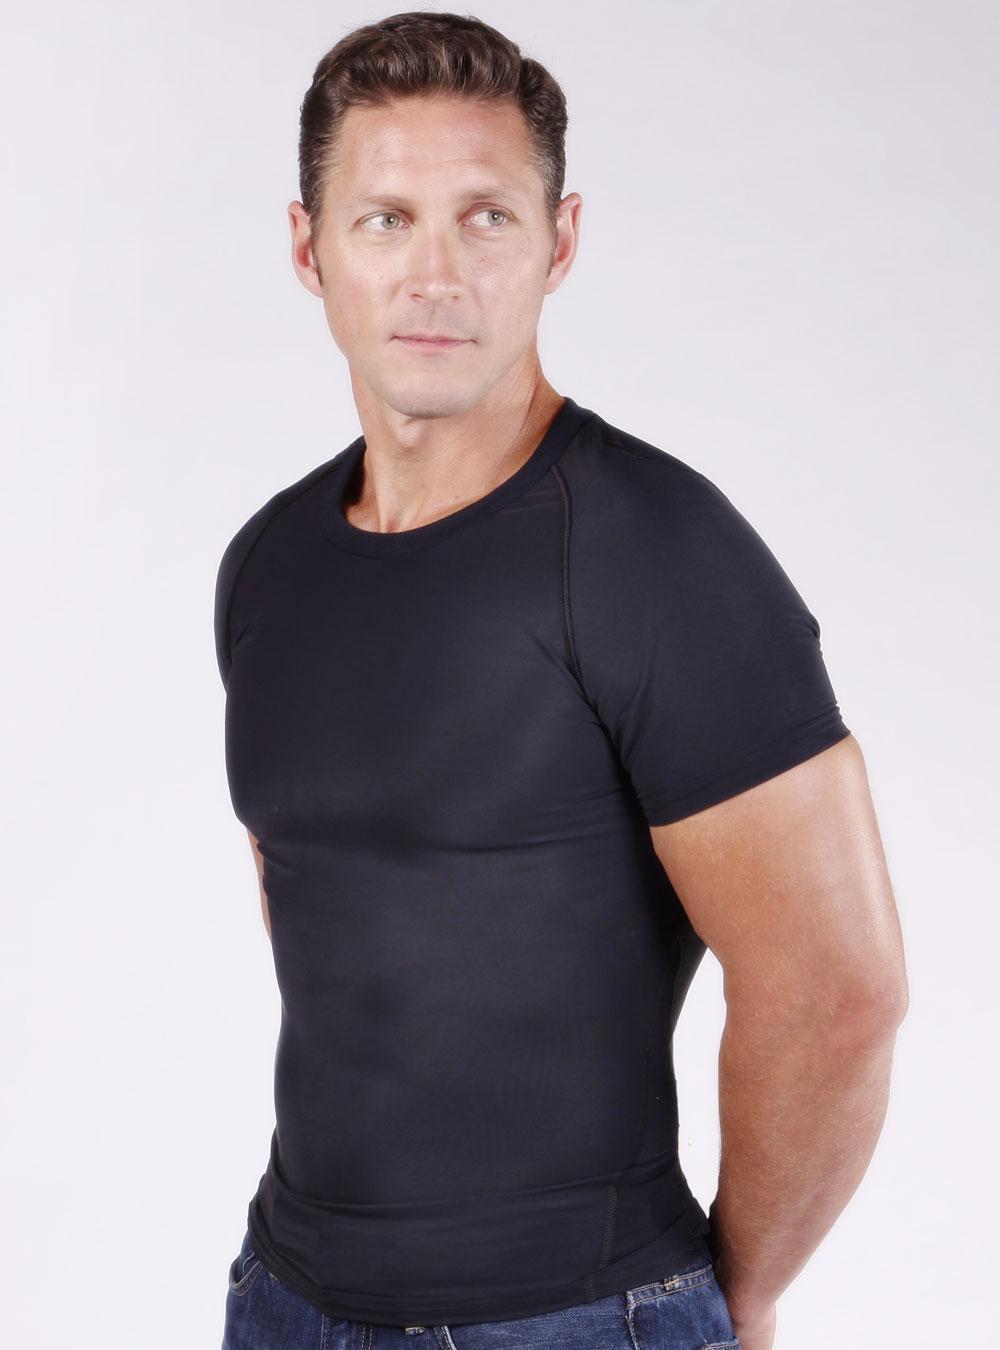 SC-175 Male Shirt